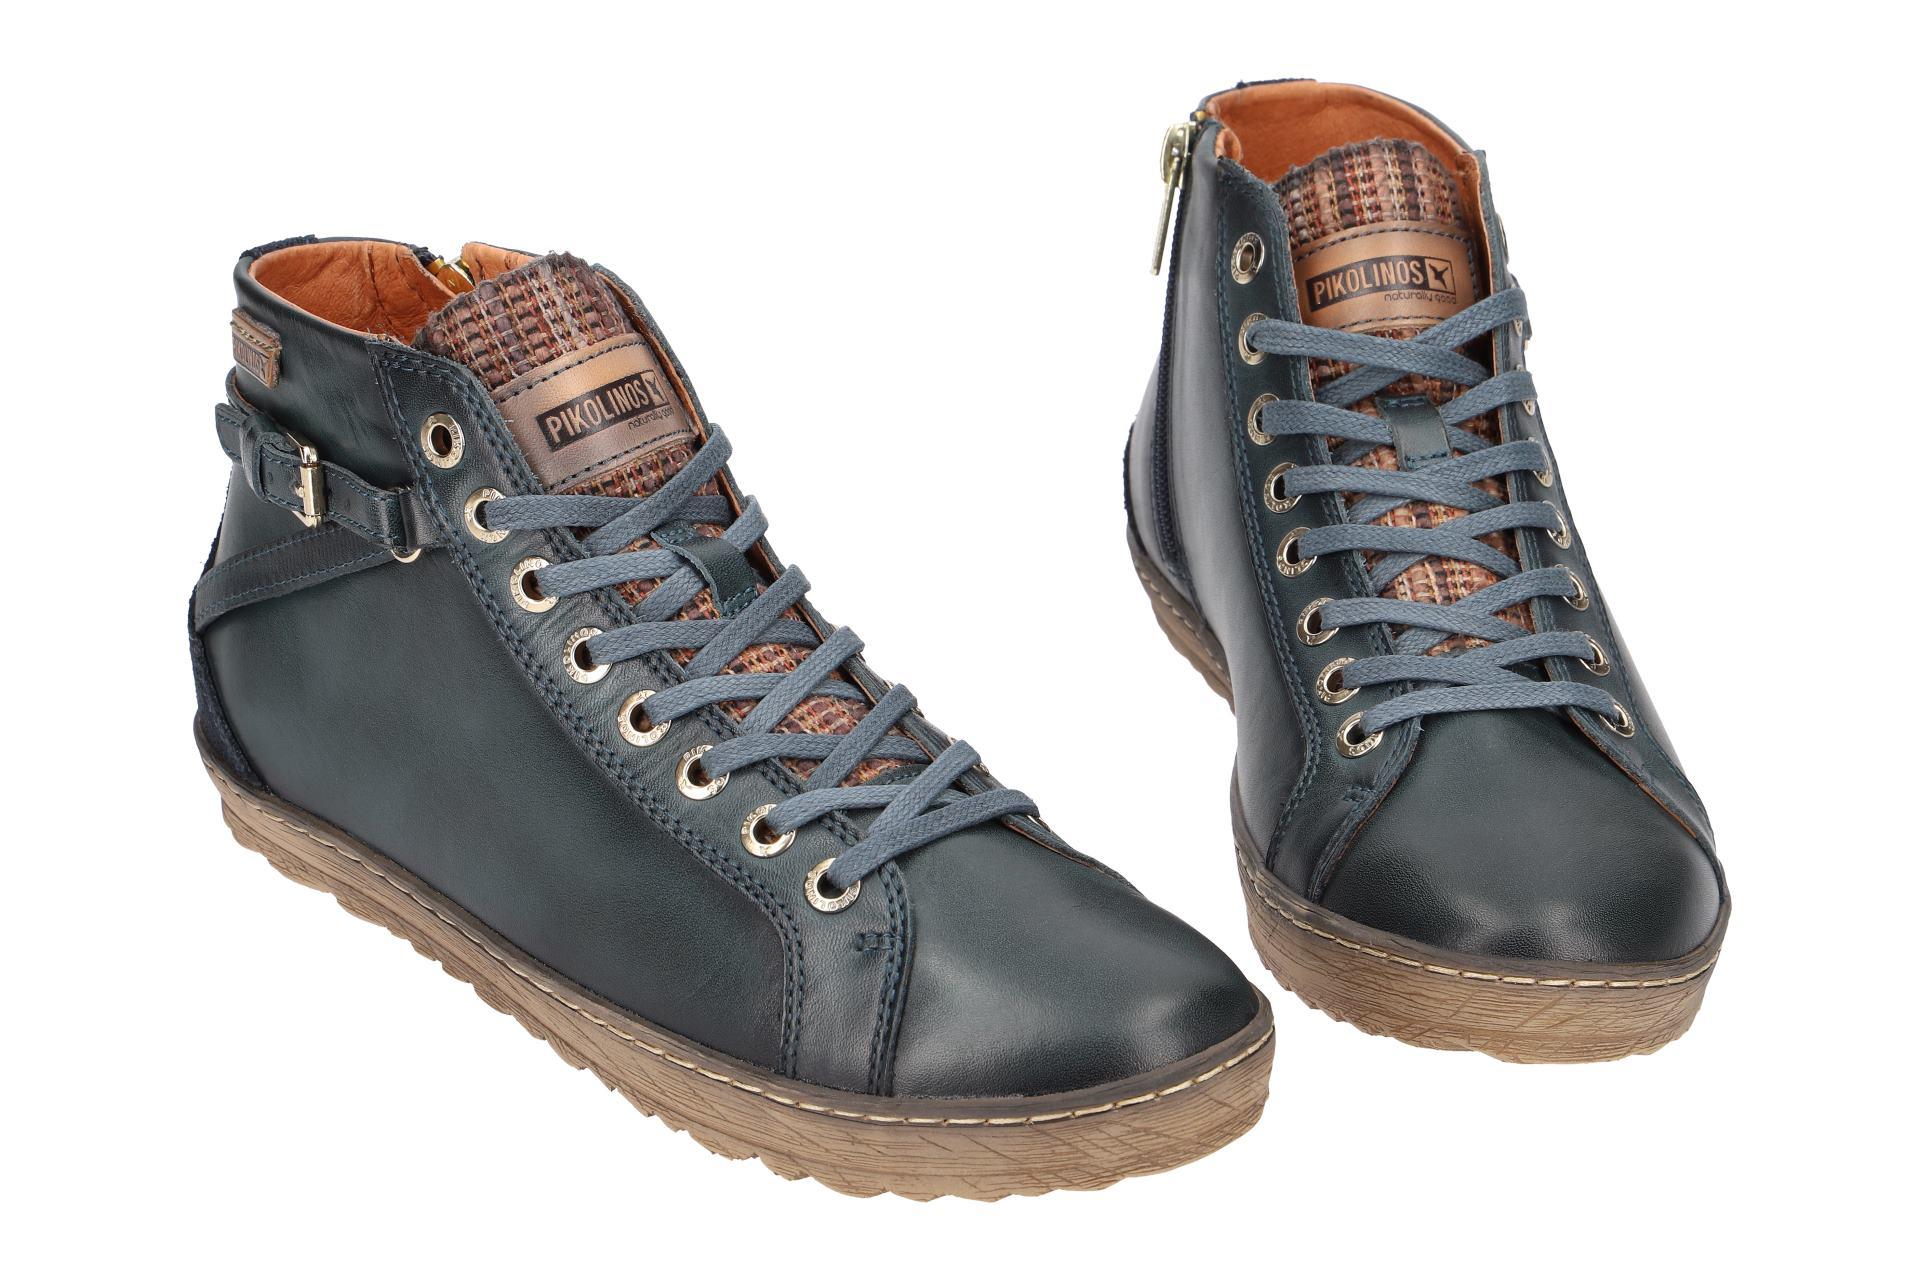 Details zu Pikolinos Schuhe LAGOS blau Damen Stiefeletten 901 7312 ocean cobalt NEU